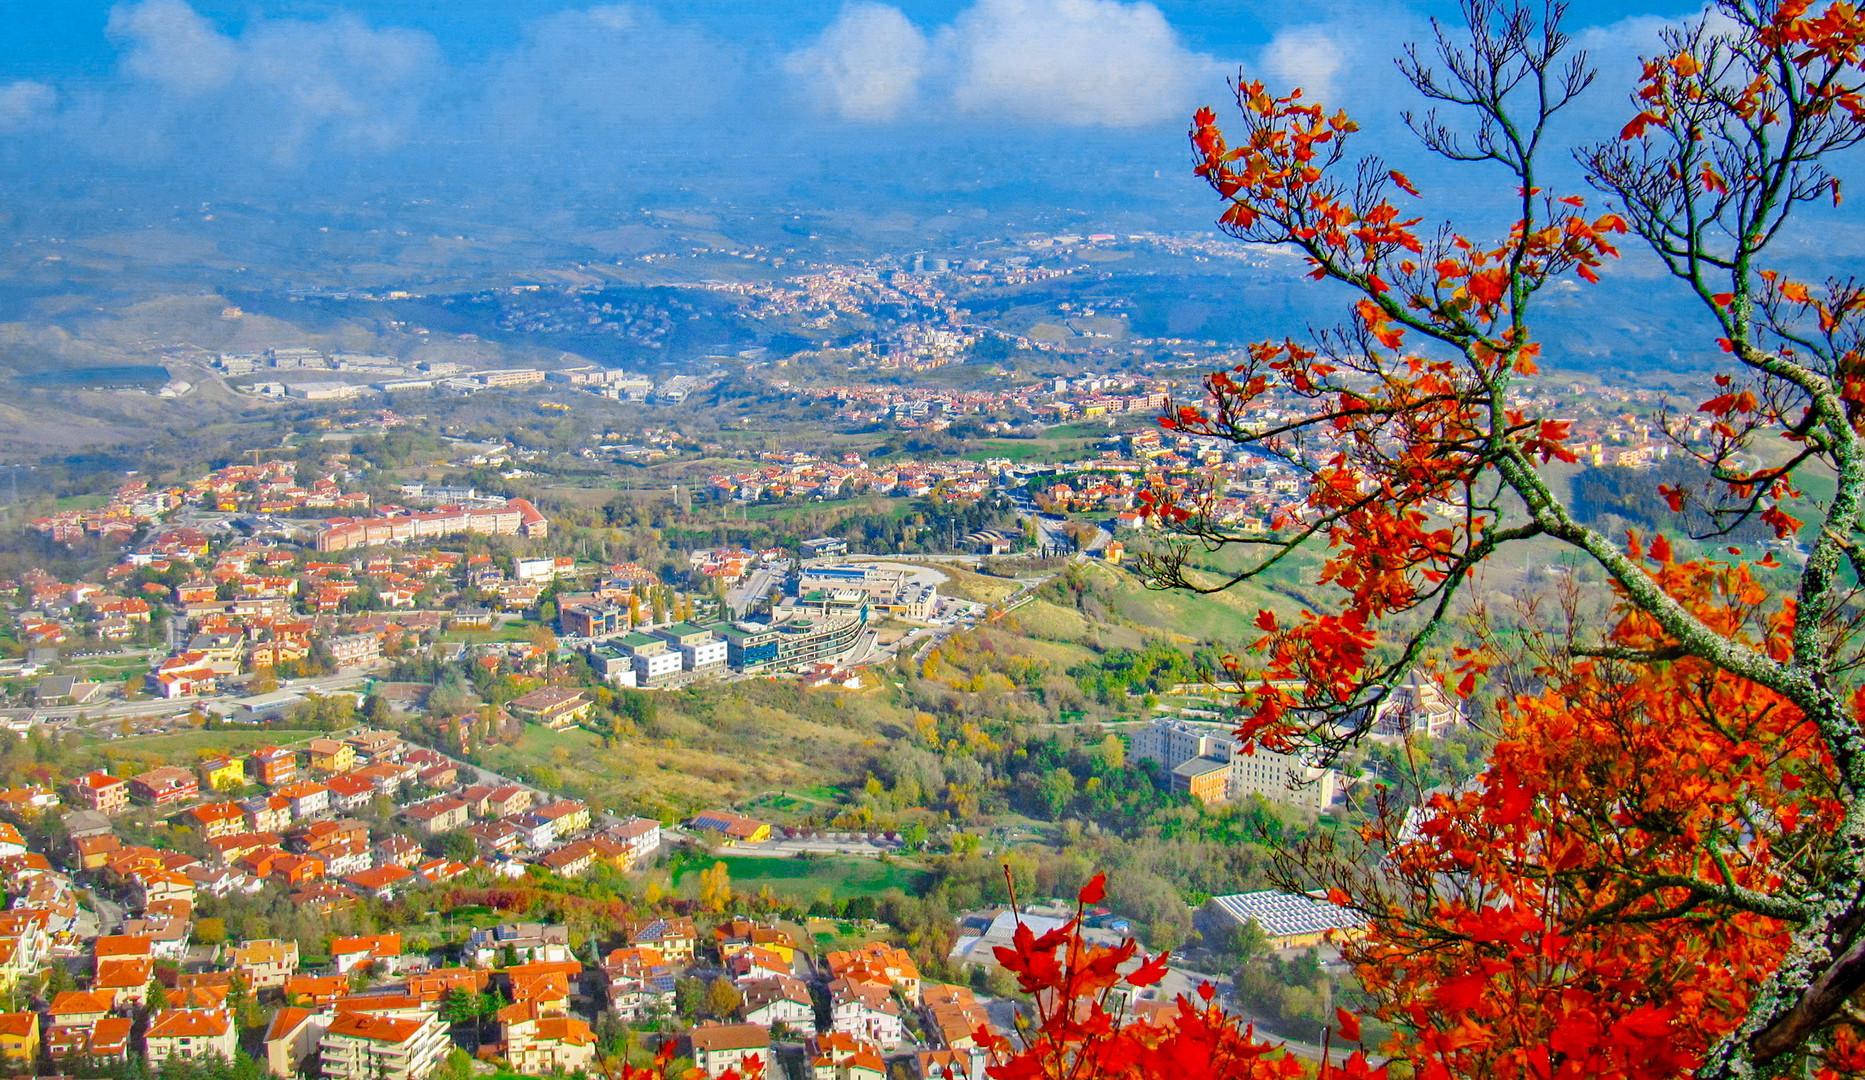 Панорама республики Сан-Марино